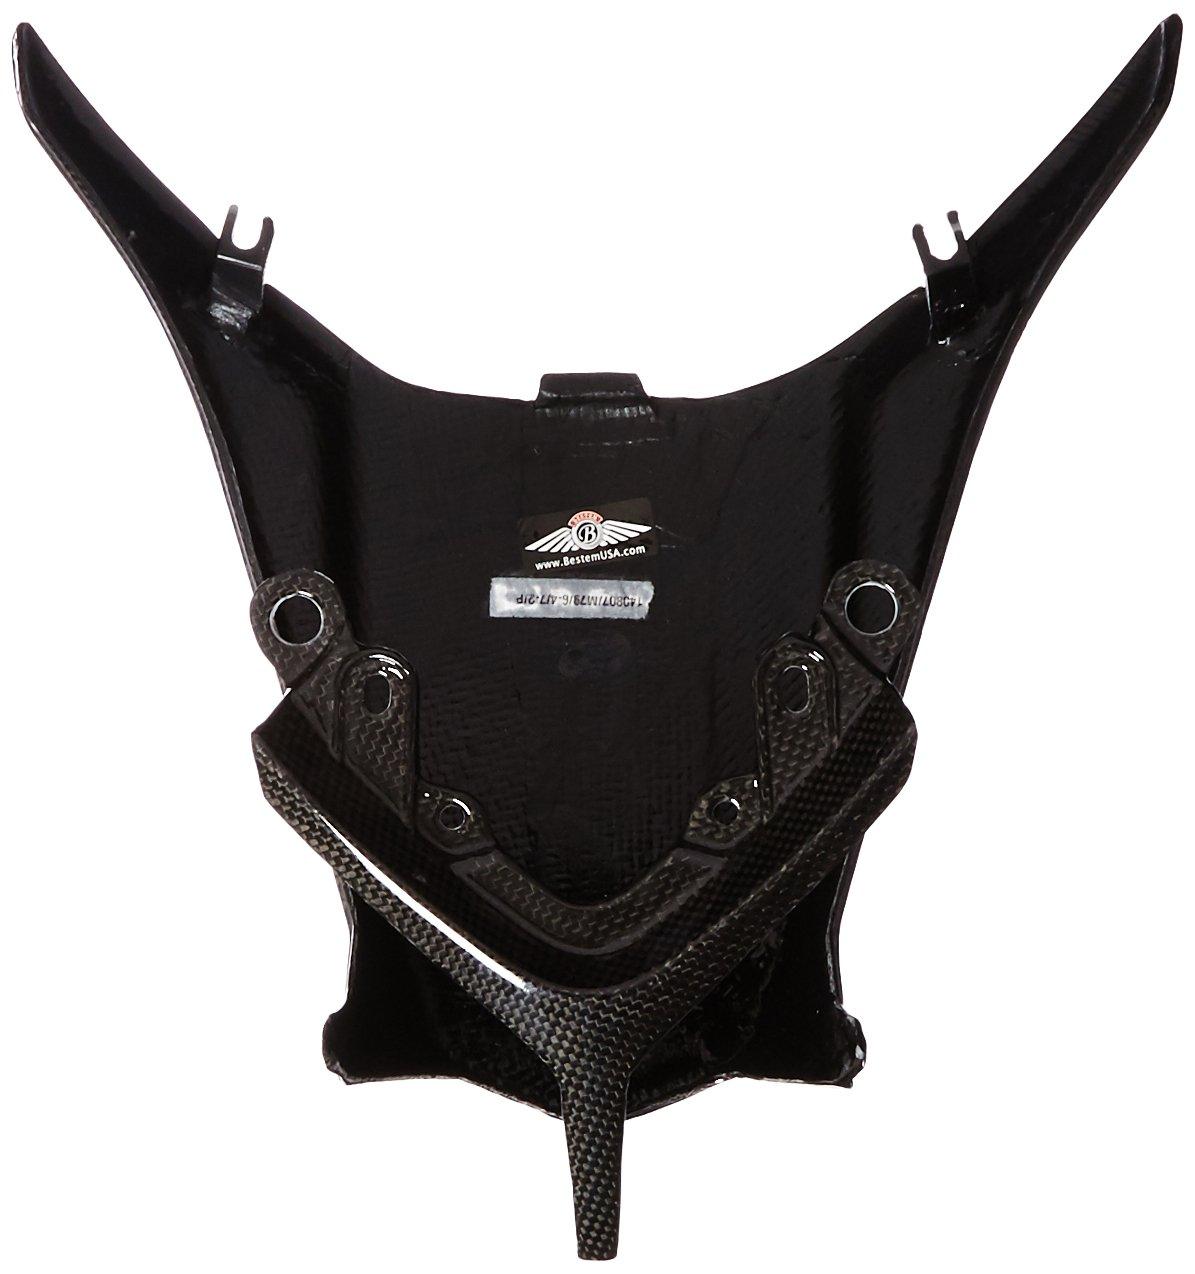 Bestem CBMV-F410-STC Black Carbon Fiber Seat Tail Cover for MV Agusta F4 2010